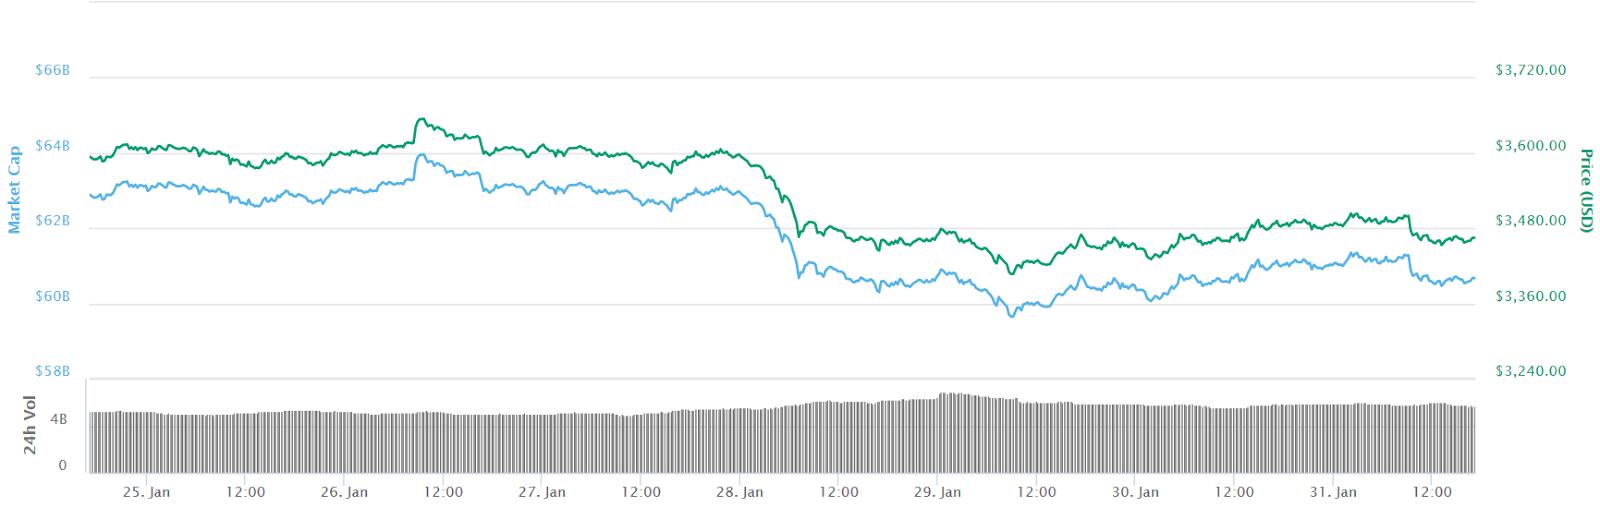 Bitcoin 7-Tage-Kurschart. Quelle: Coinmarketcap